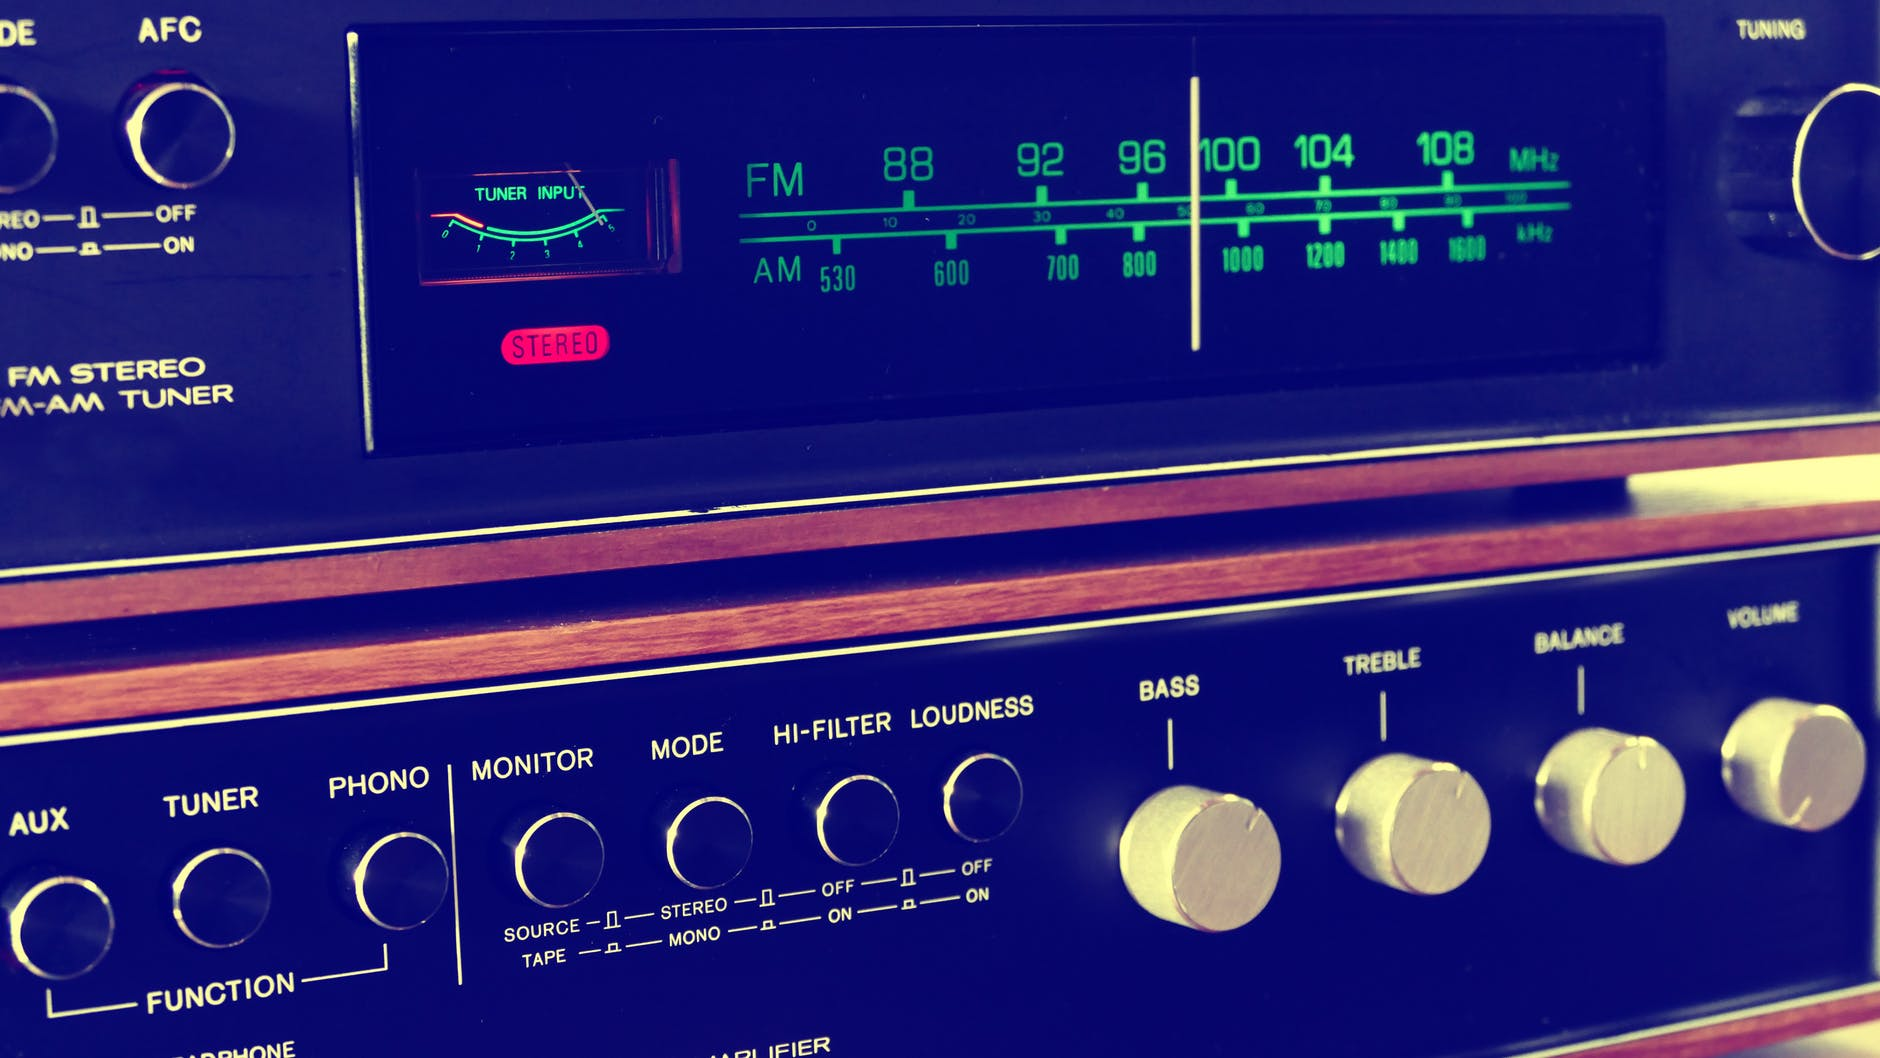 analogue buttons design display